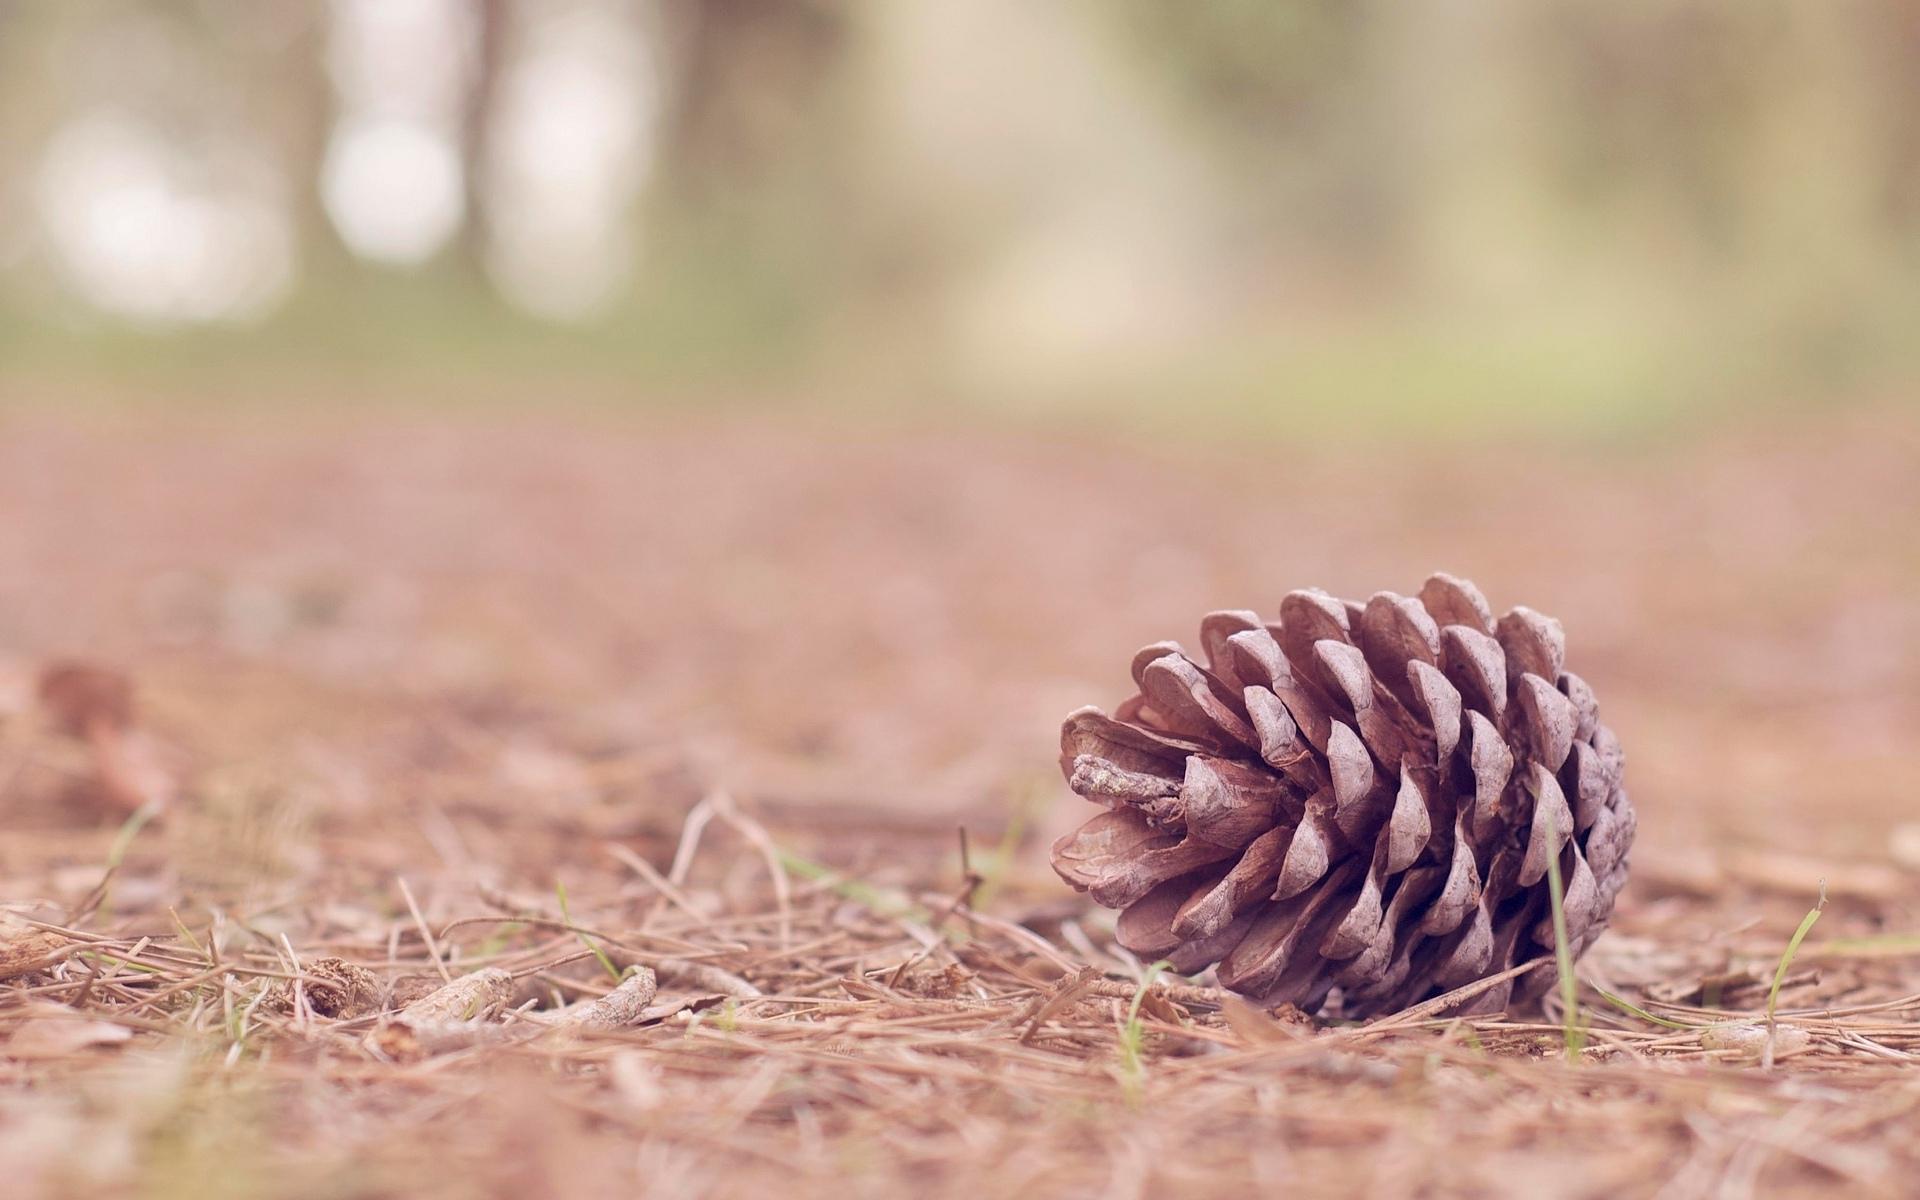 Pine cone ornaments fir branch beads wallpaper x